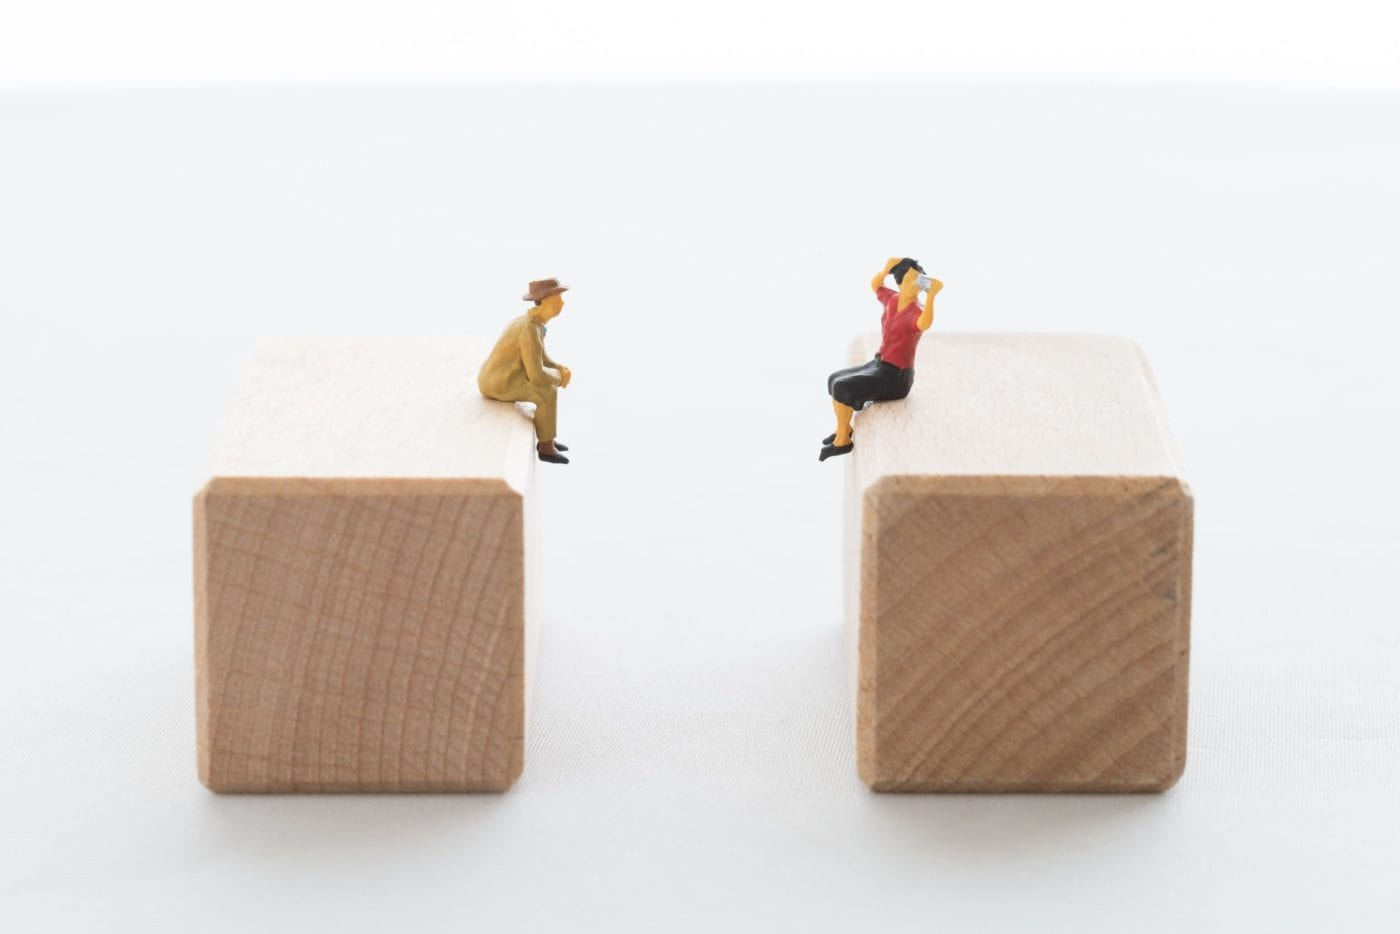 Salary Survey 2017: Marketing is still misunderstood by businesses